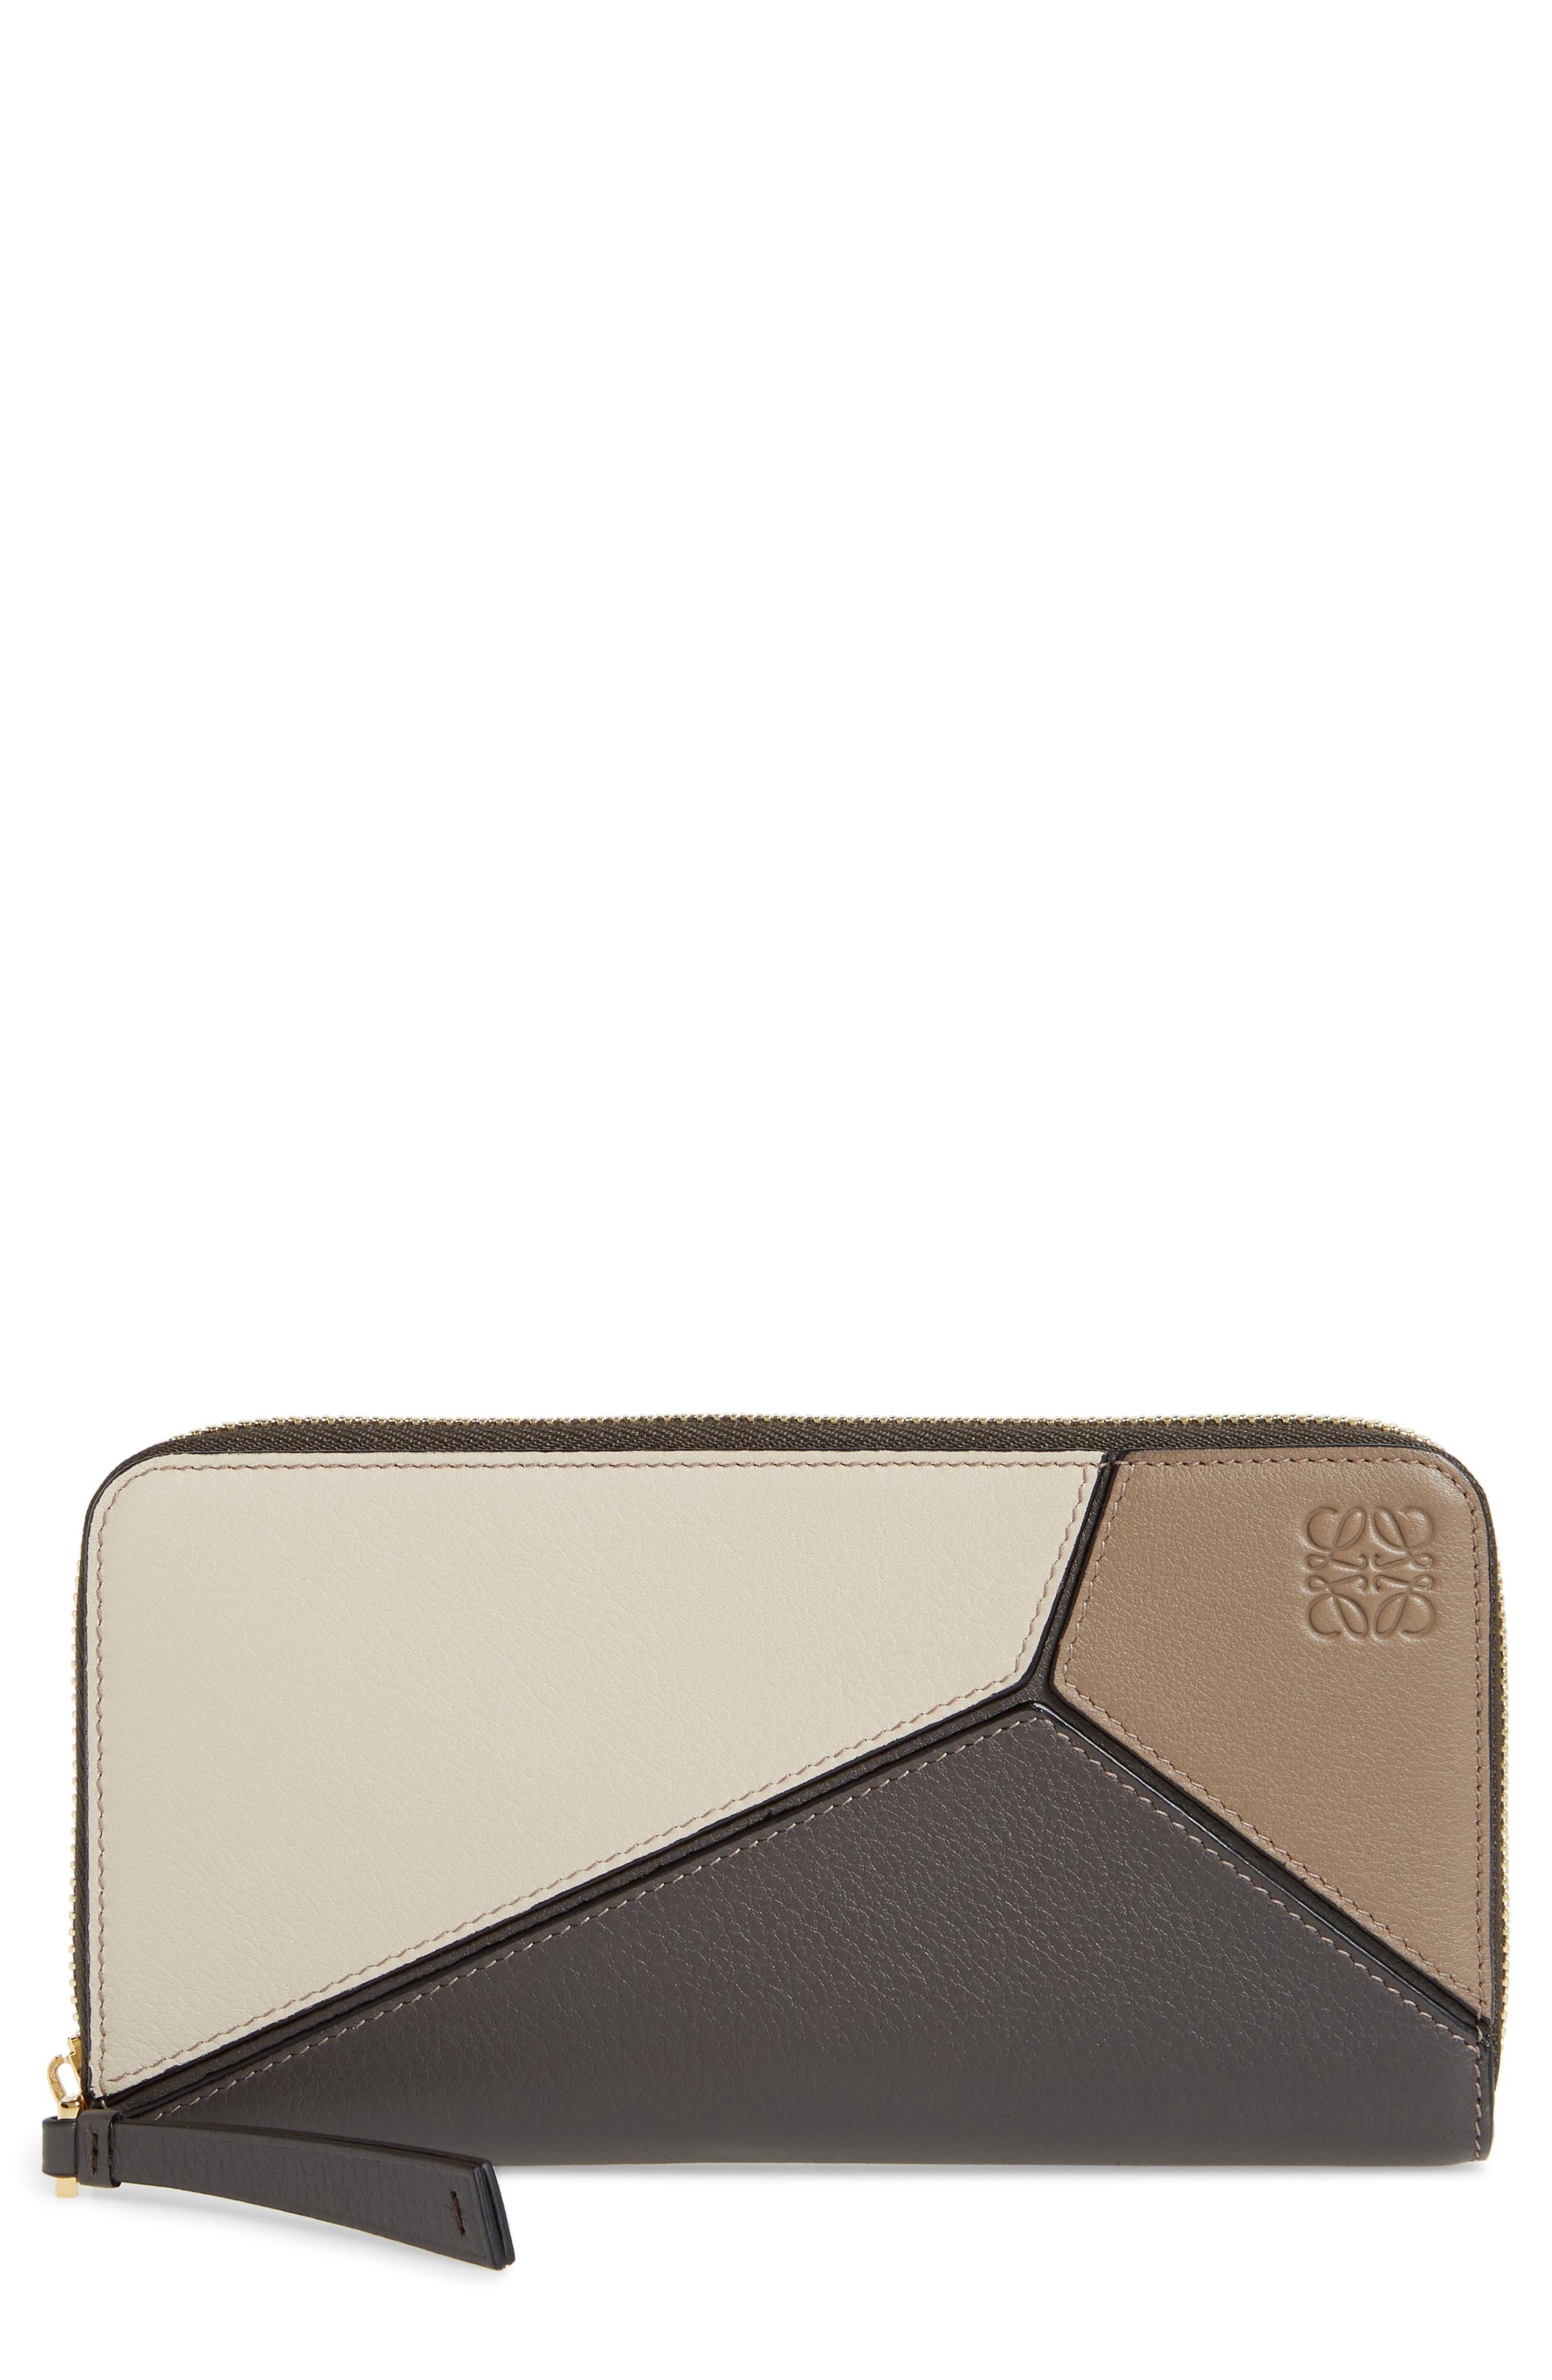 Loewe Puzzle Leather Zip Around Wallet